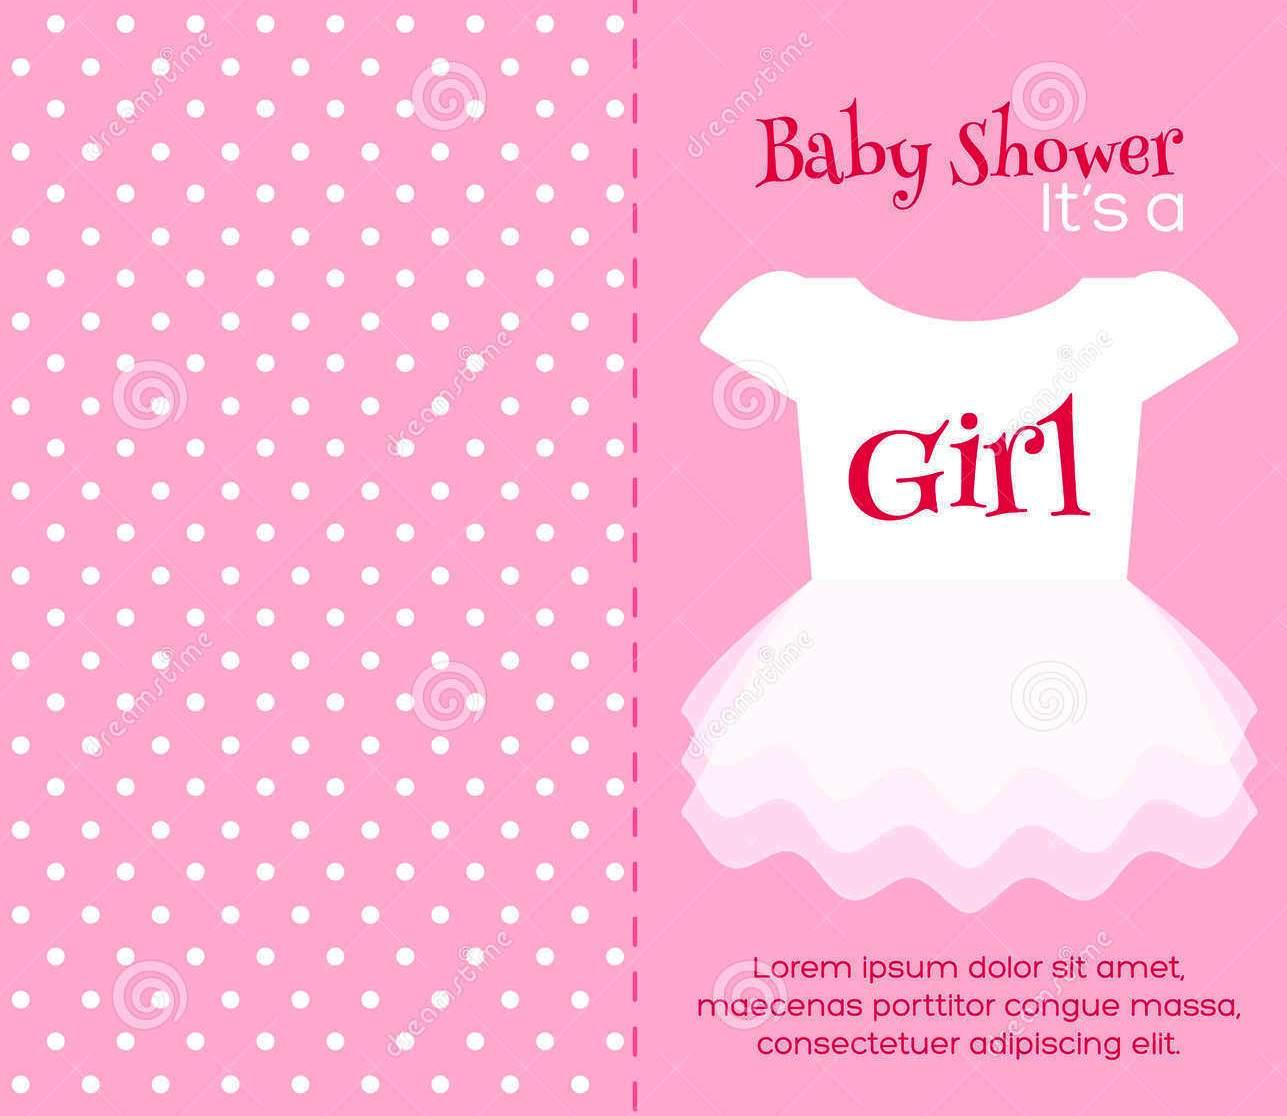 Baby Shower Invitations Blank Baby Shower Invitations Grohe - Free Printable Blank Baby Shower Invitations